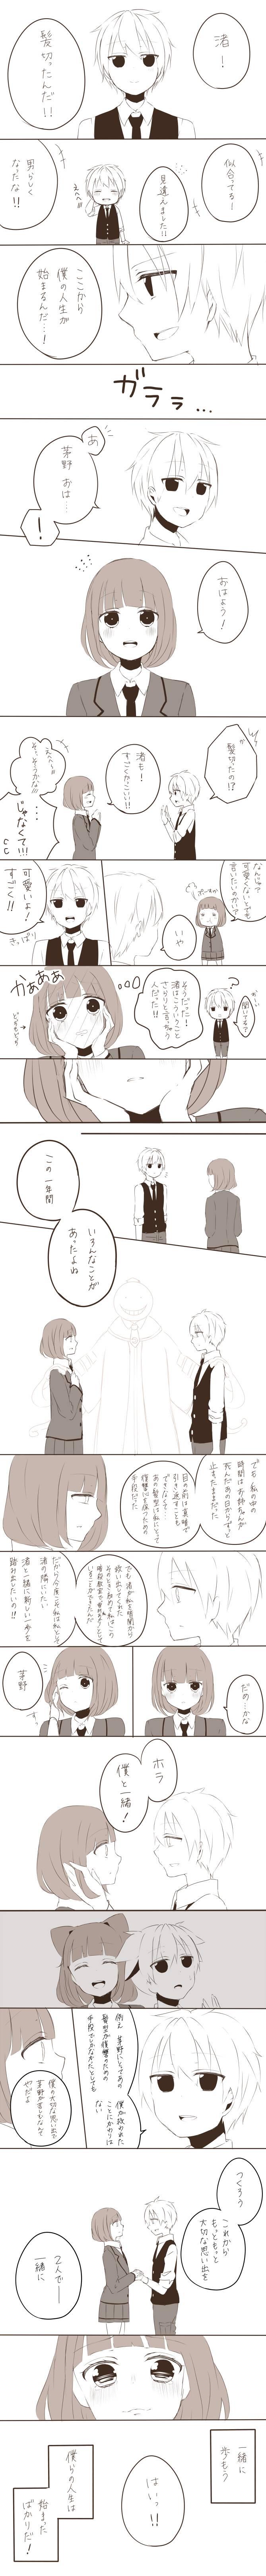 カエ 渚 暗殺 教室